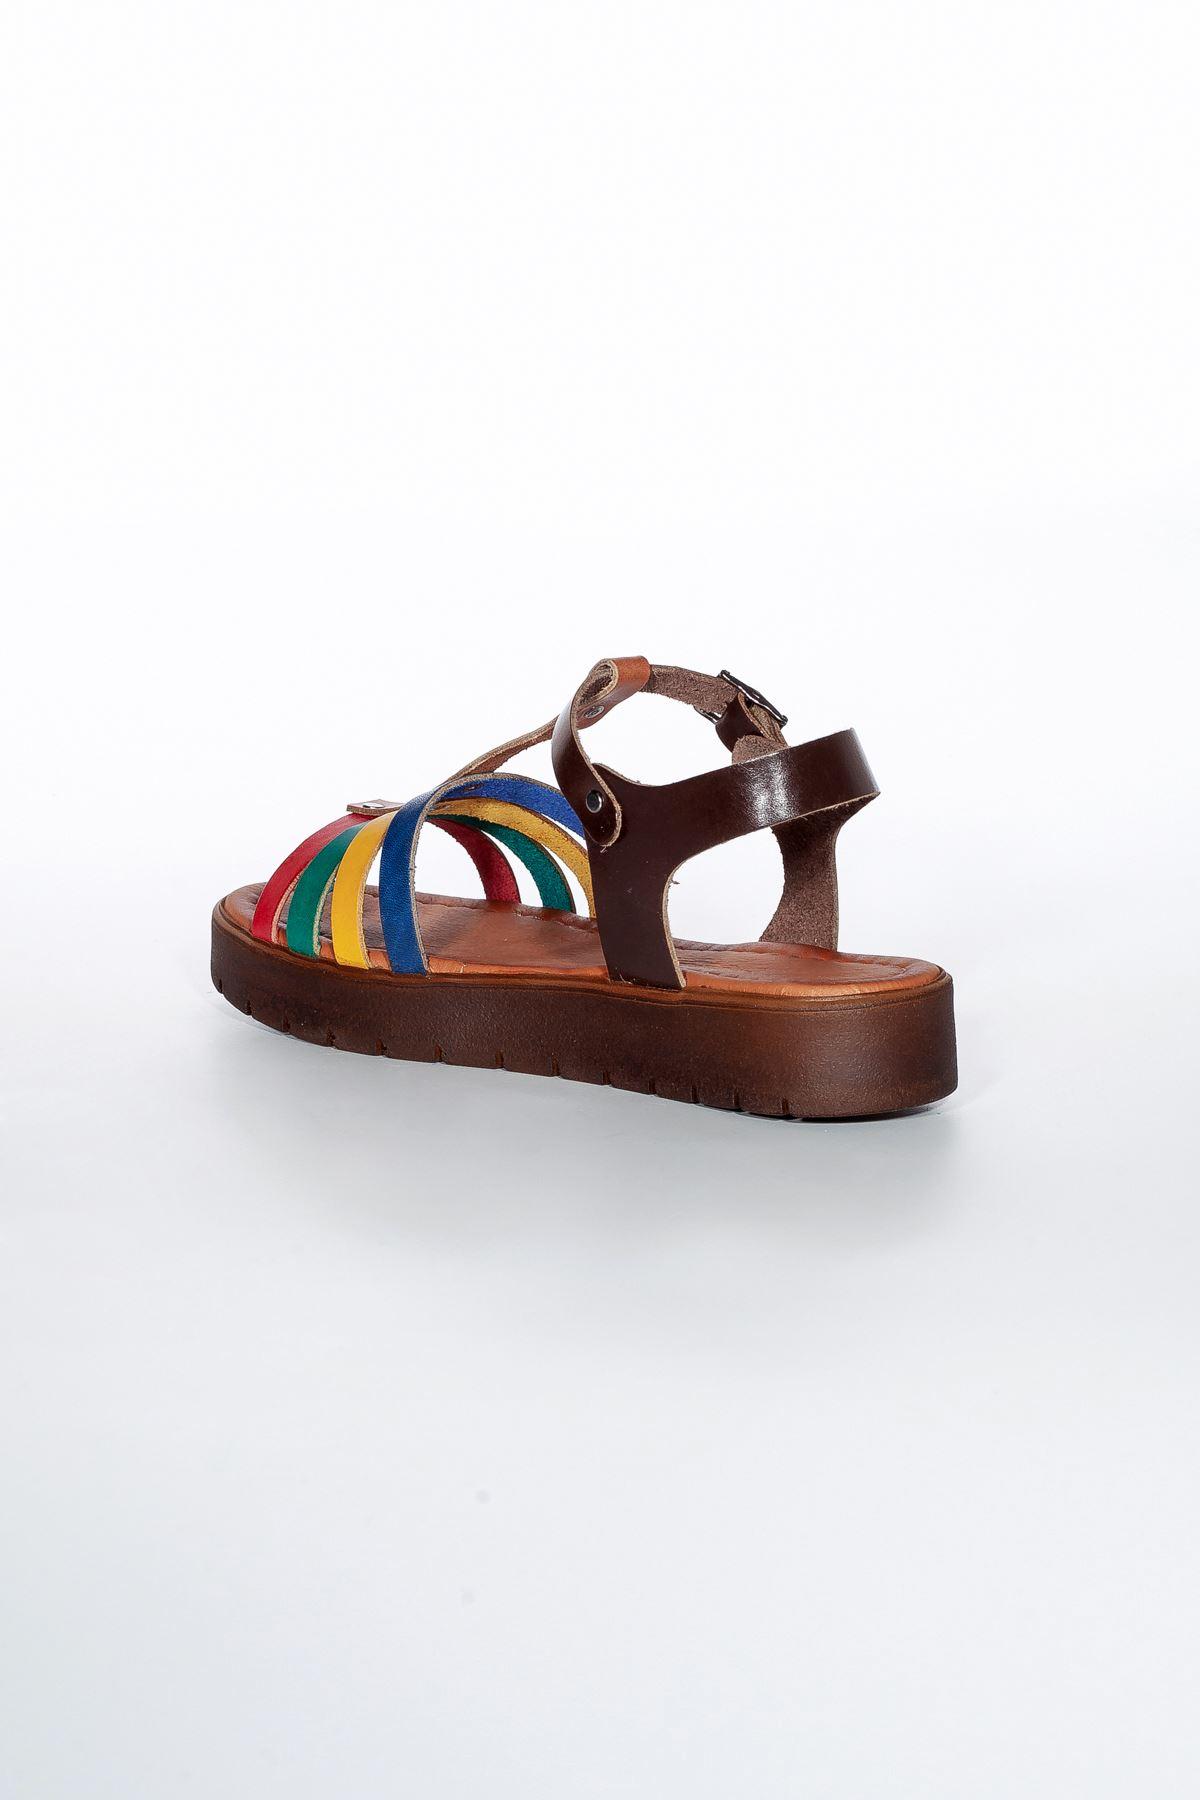 Ewran RT3132 Multi Bayan Hakiki Deri Sandalet